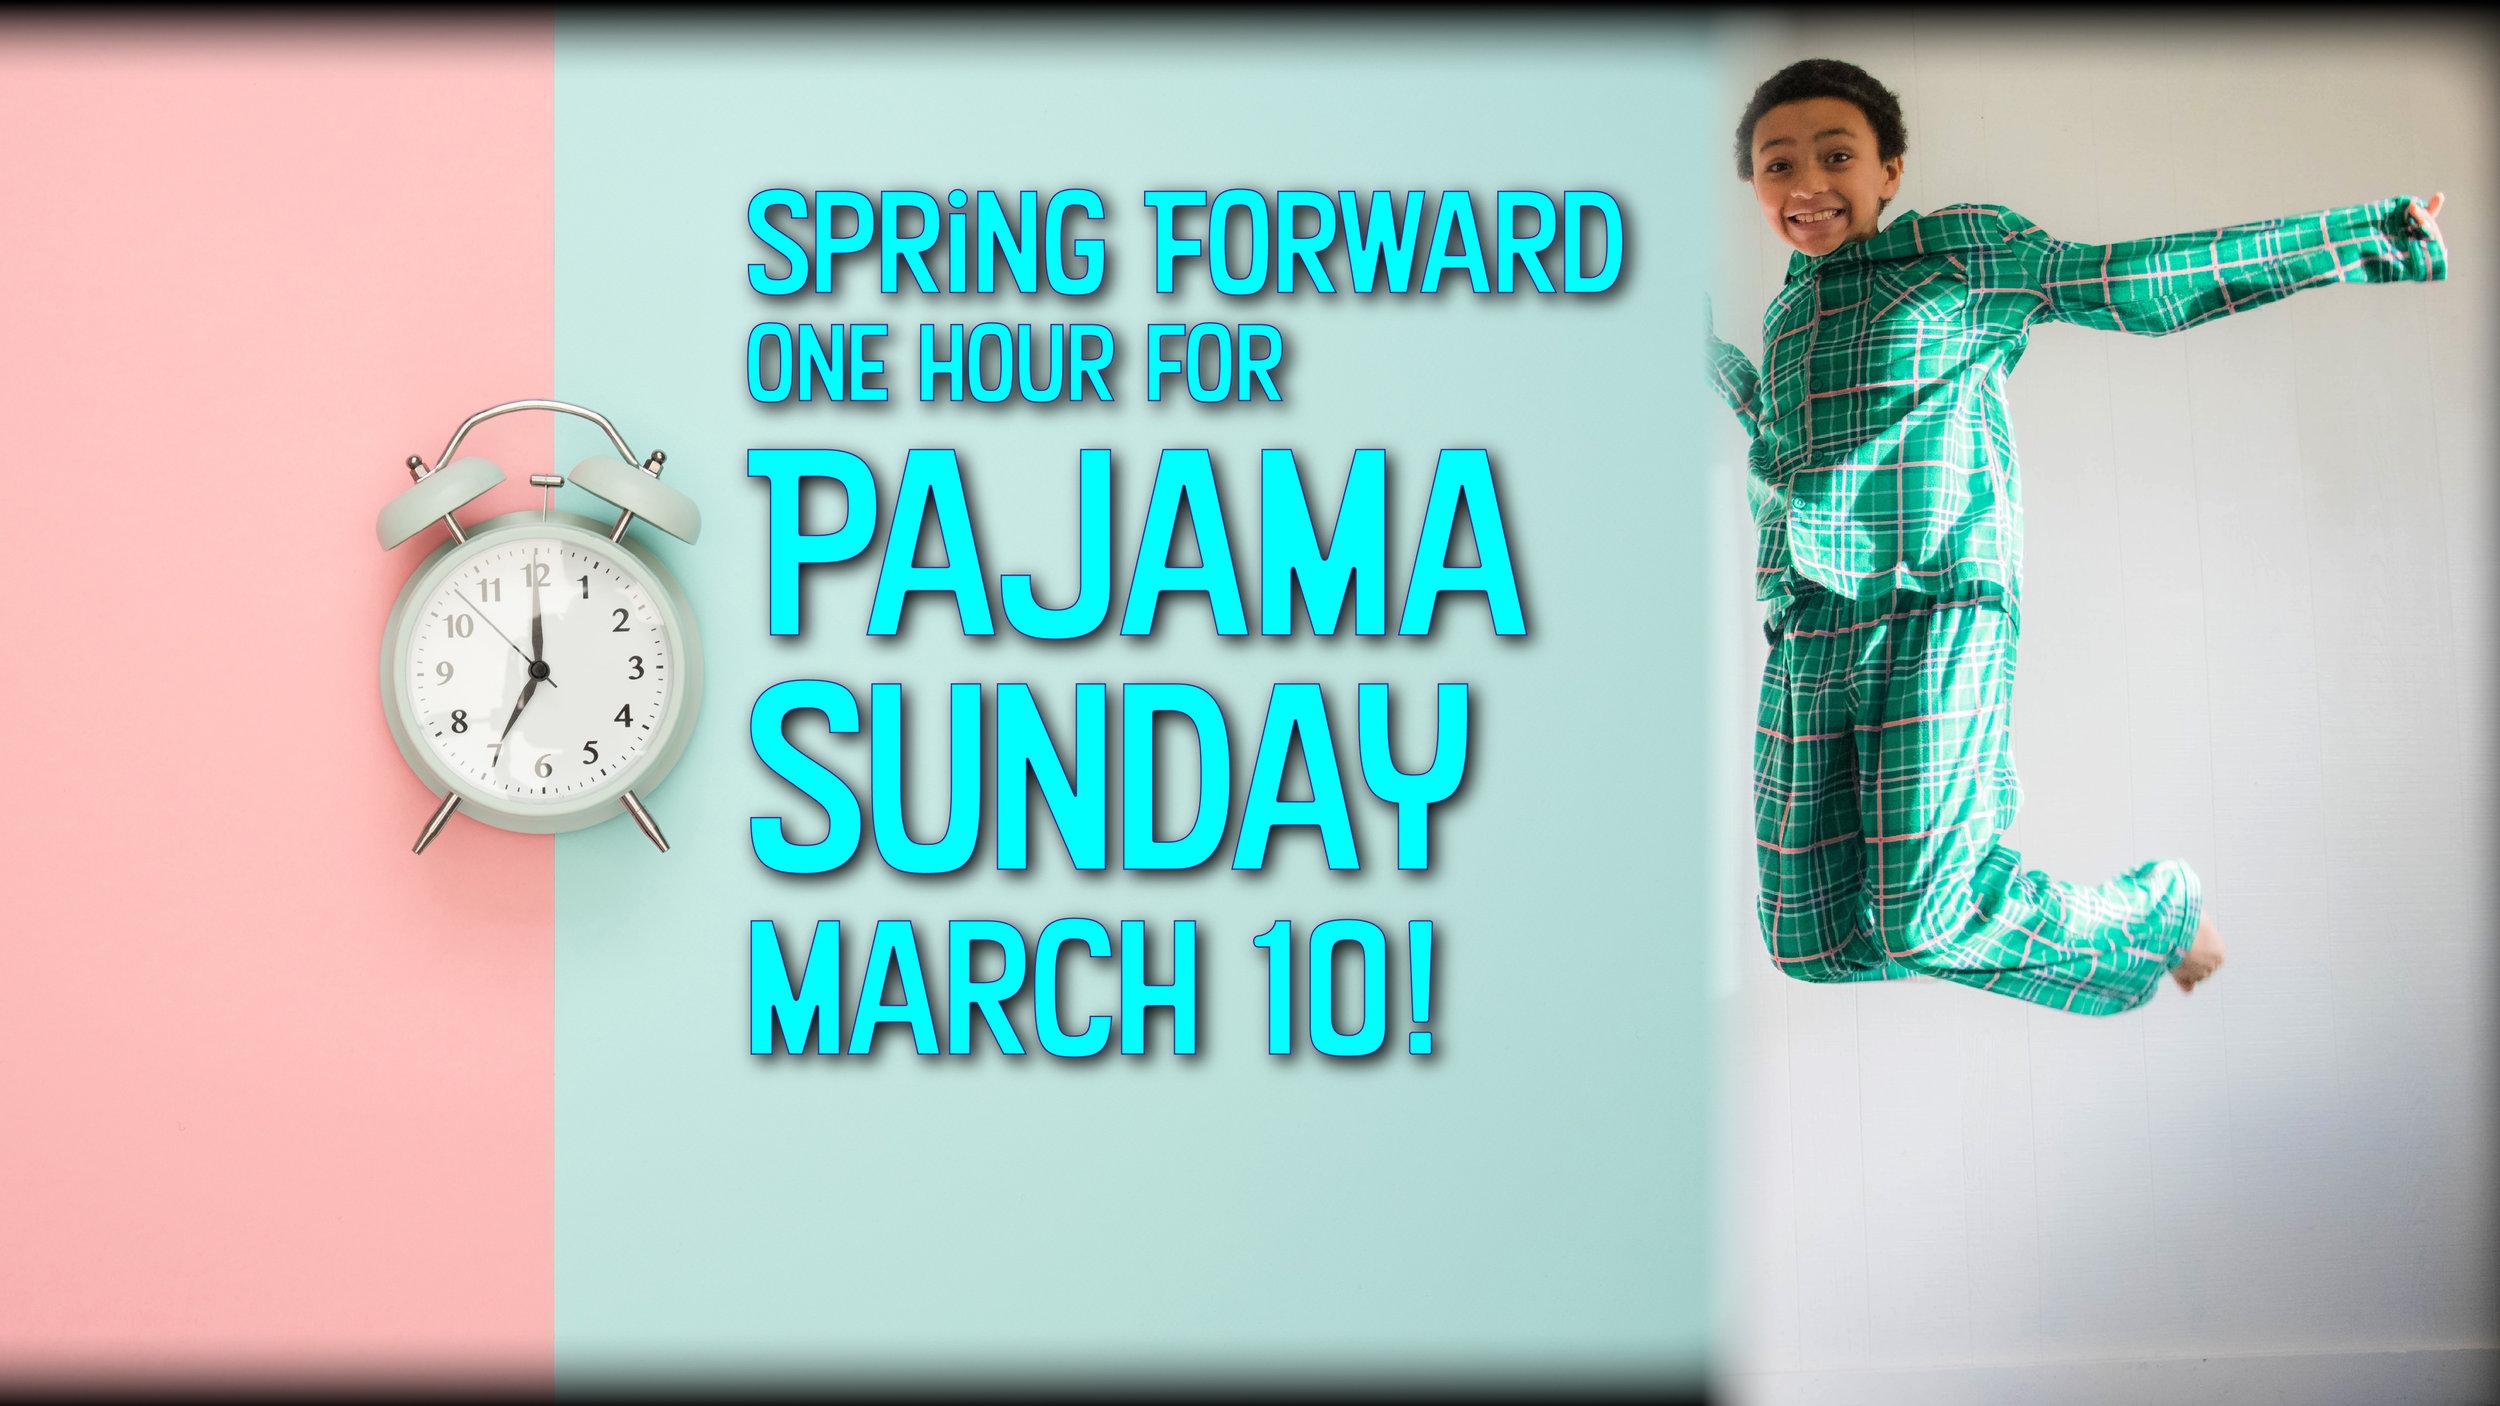 Pajama Sunday March 10 slide v1a.jpg